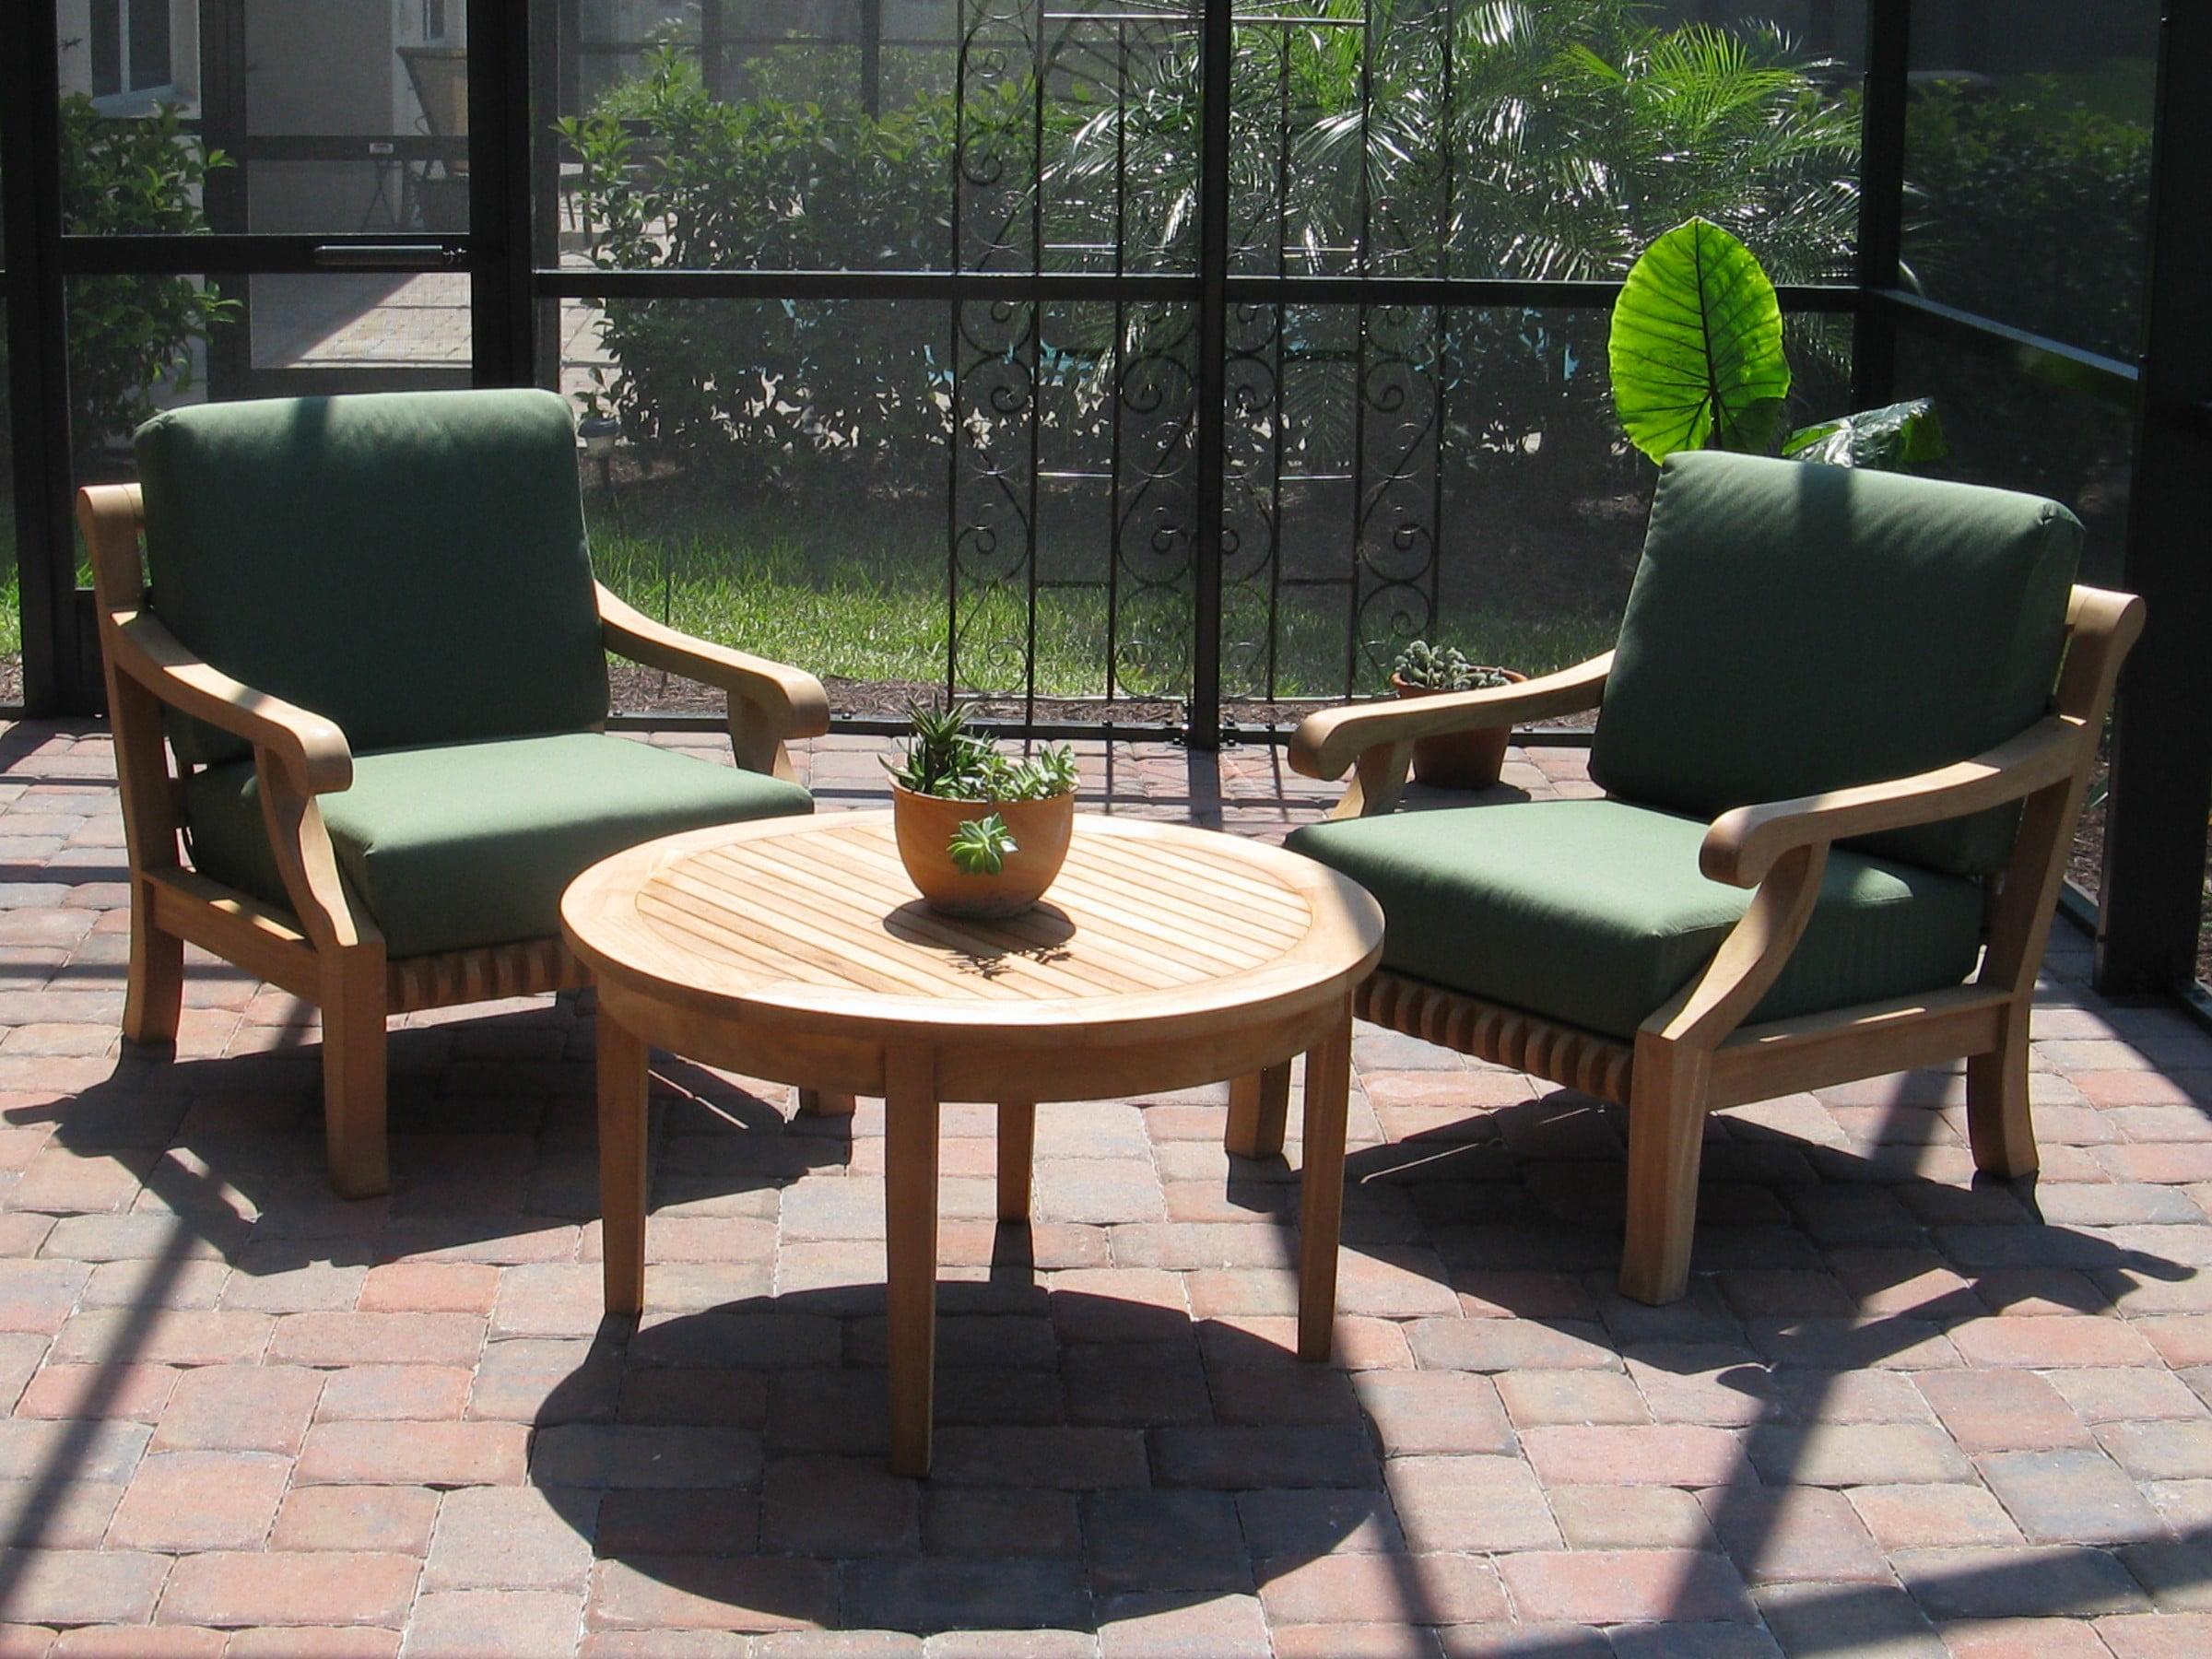 Grade A Teak Wood Sofa Set 3pc 2 Seater Teak Sofa Lounge Chair Set 2 Lounge Chairs 1 Sack Round Coffee Table Furniture Only Giva Collection Wmssgv7 Walmart Com Walmart Com